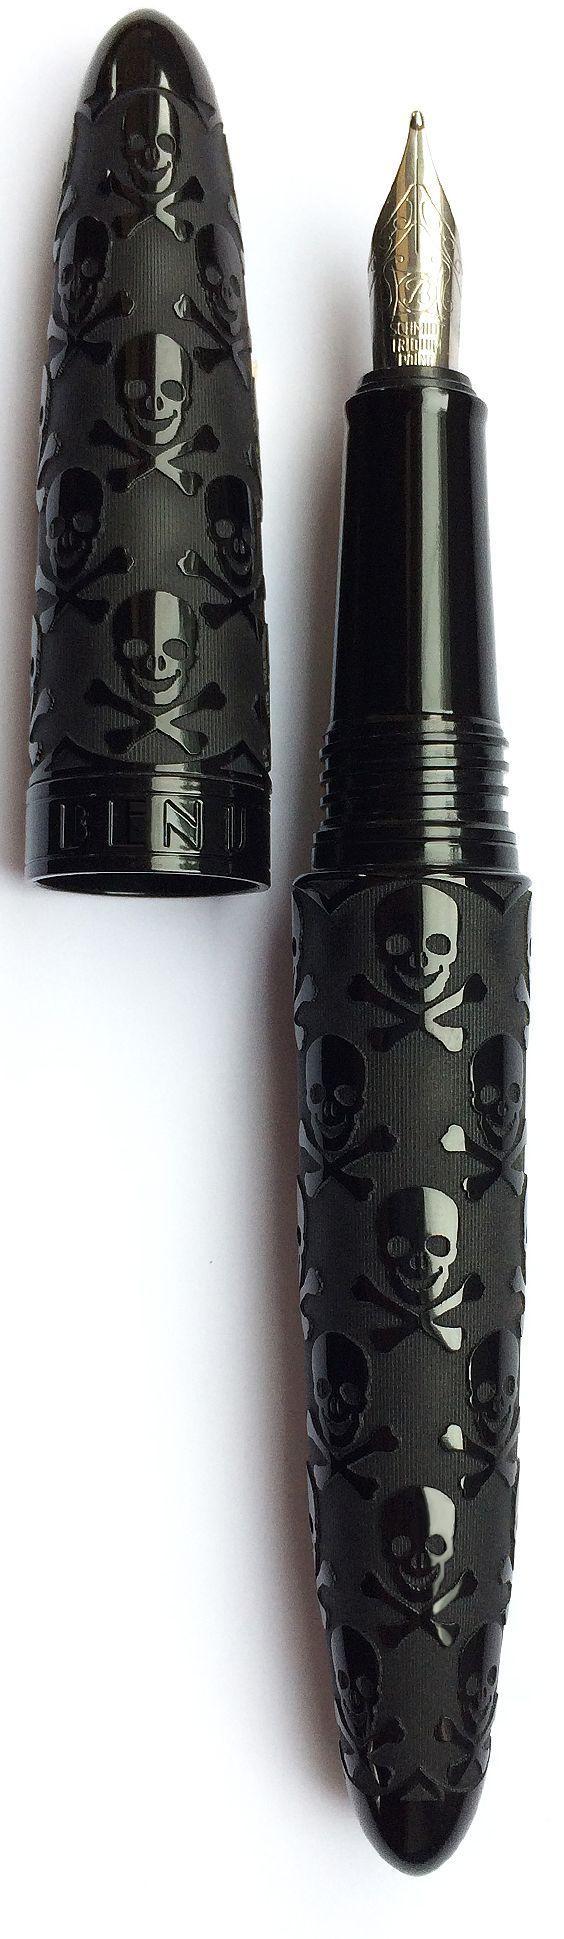 Black Skull BENU Fountain pen